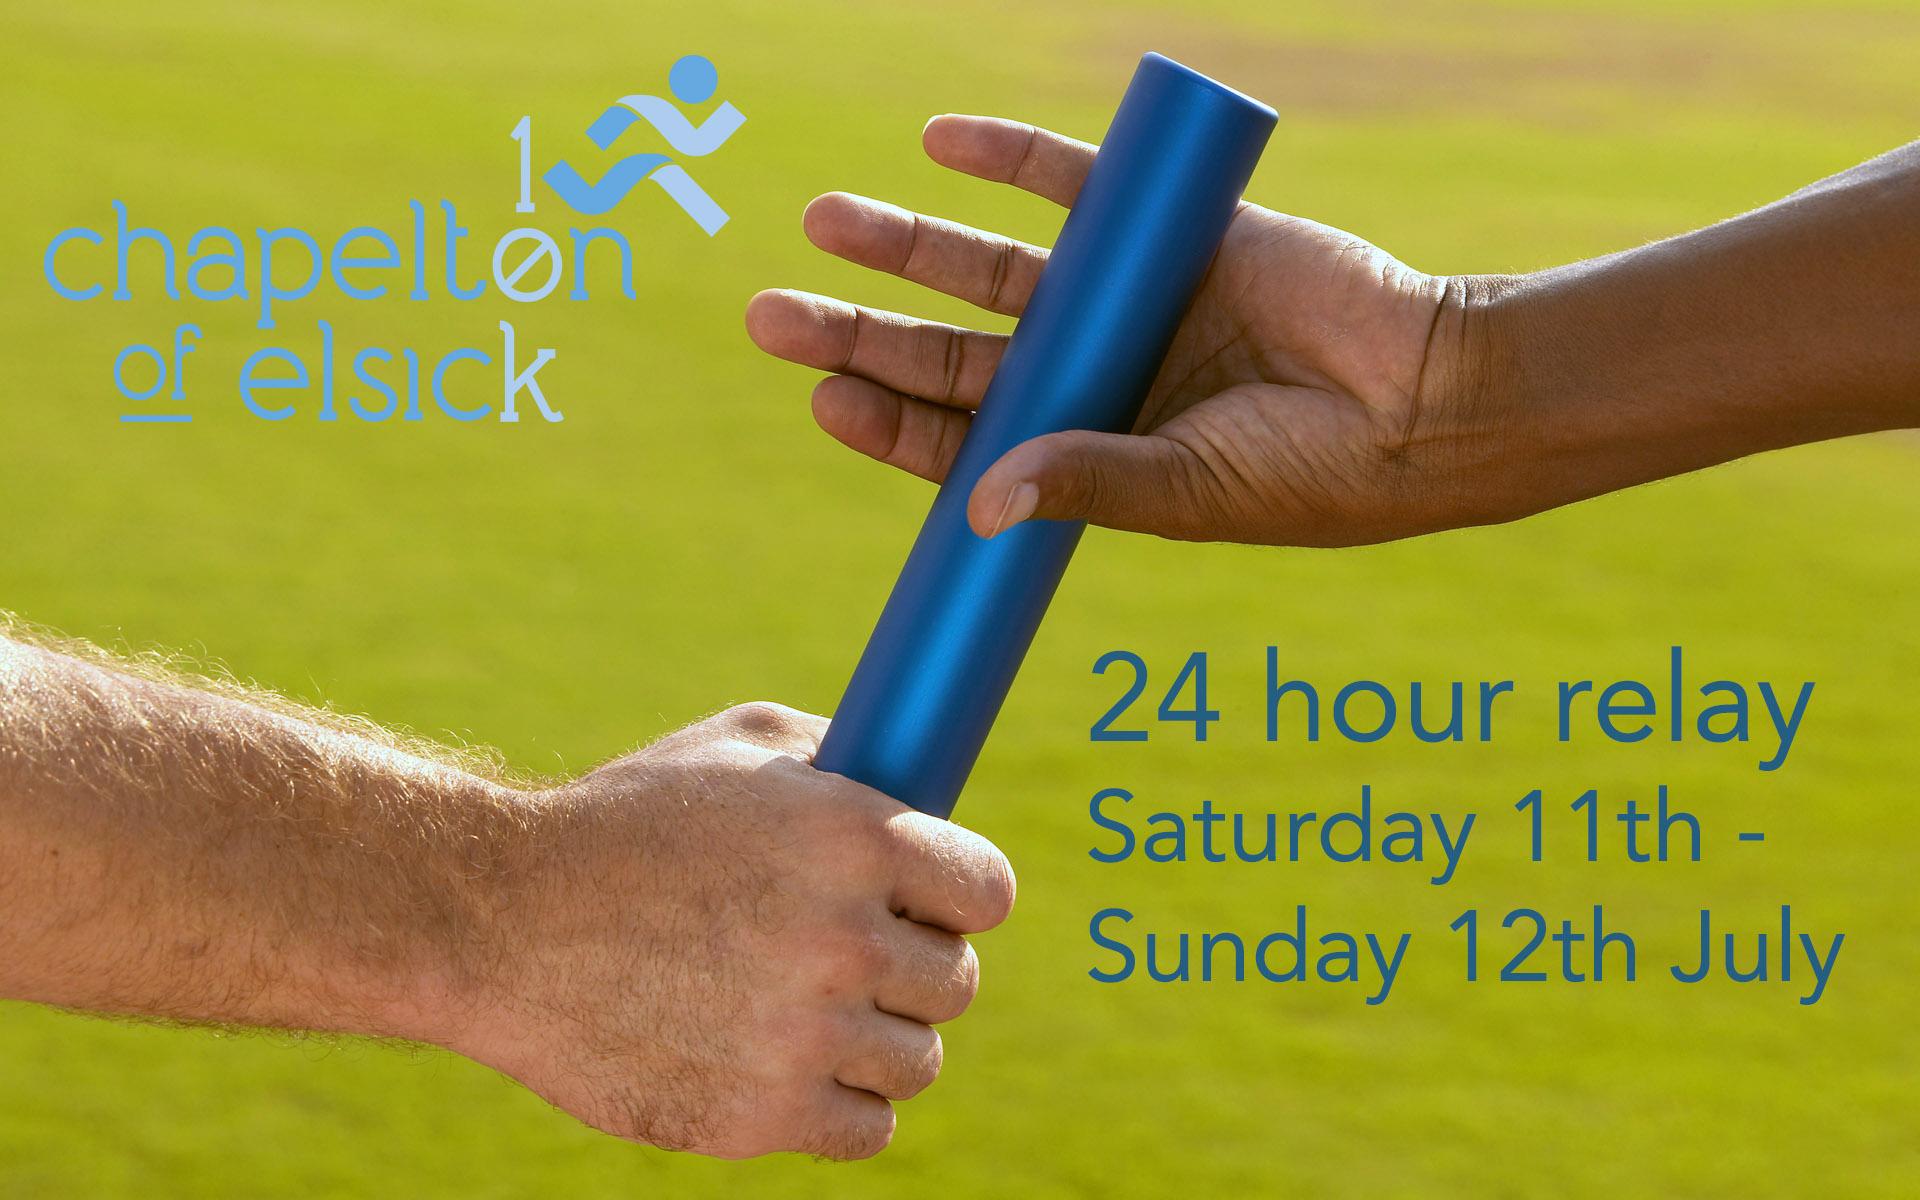 Chapelton 24 hour relay